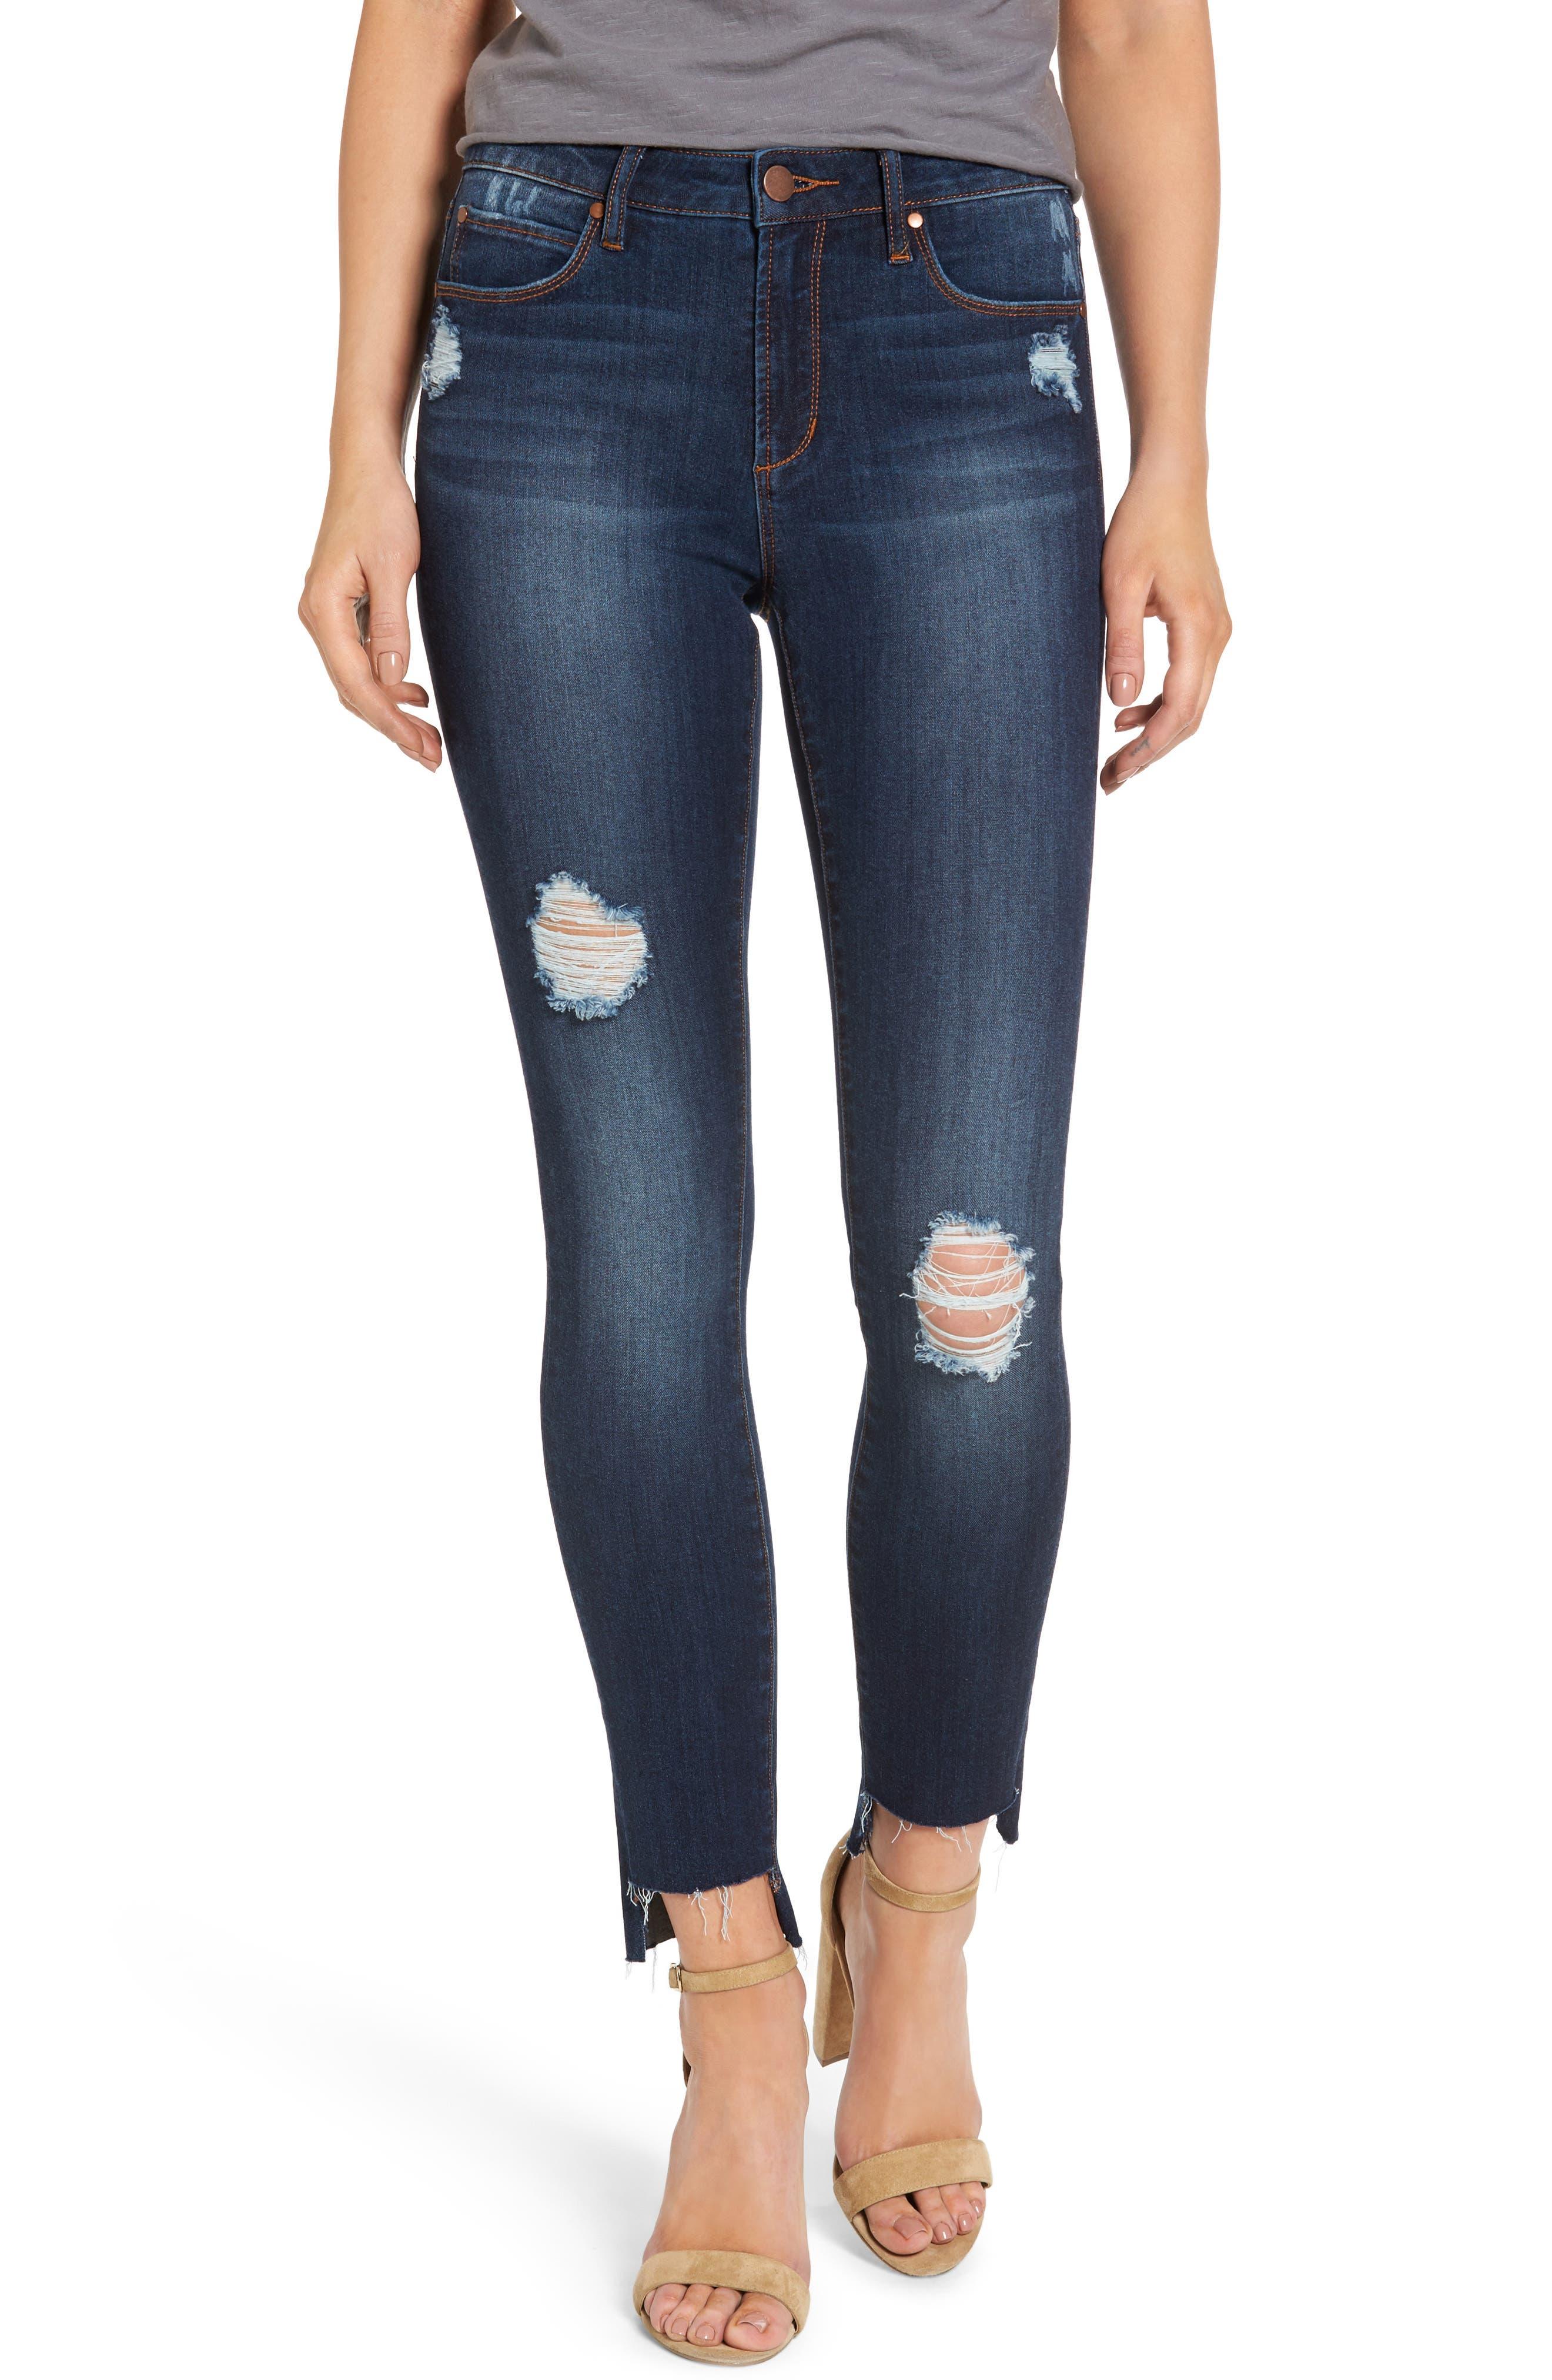 Leith Ripped Step Hem Skinny Jeans (Destroy Medium)